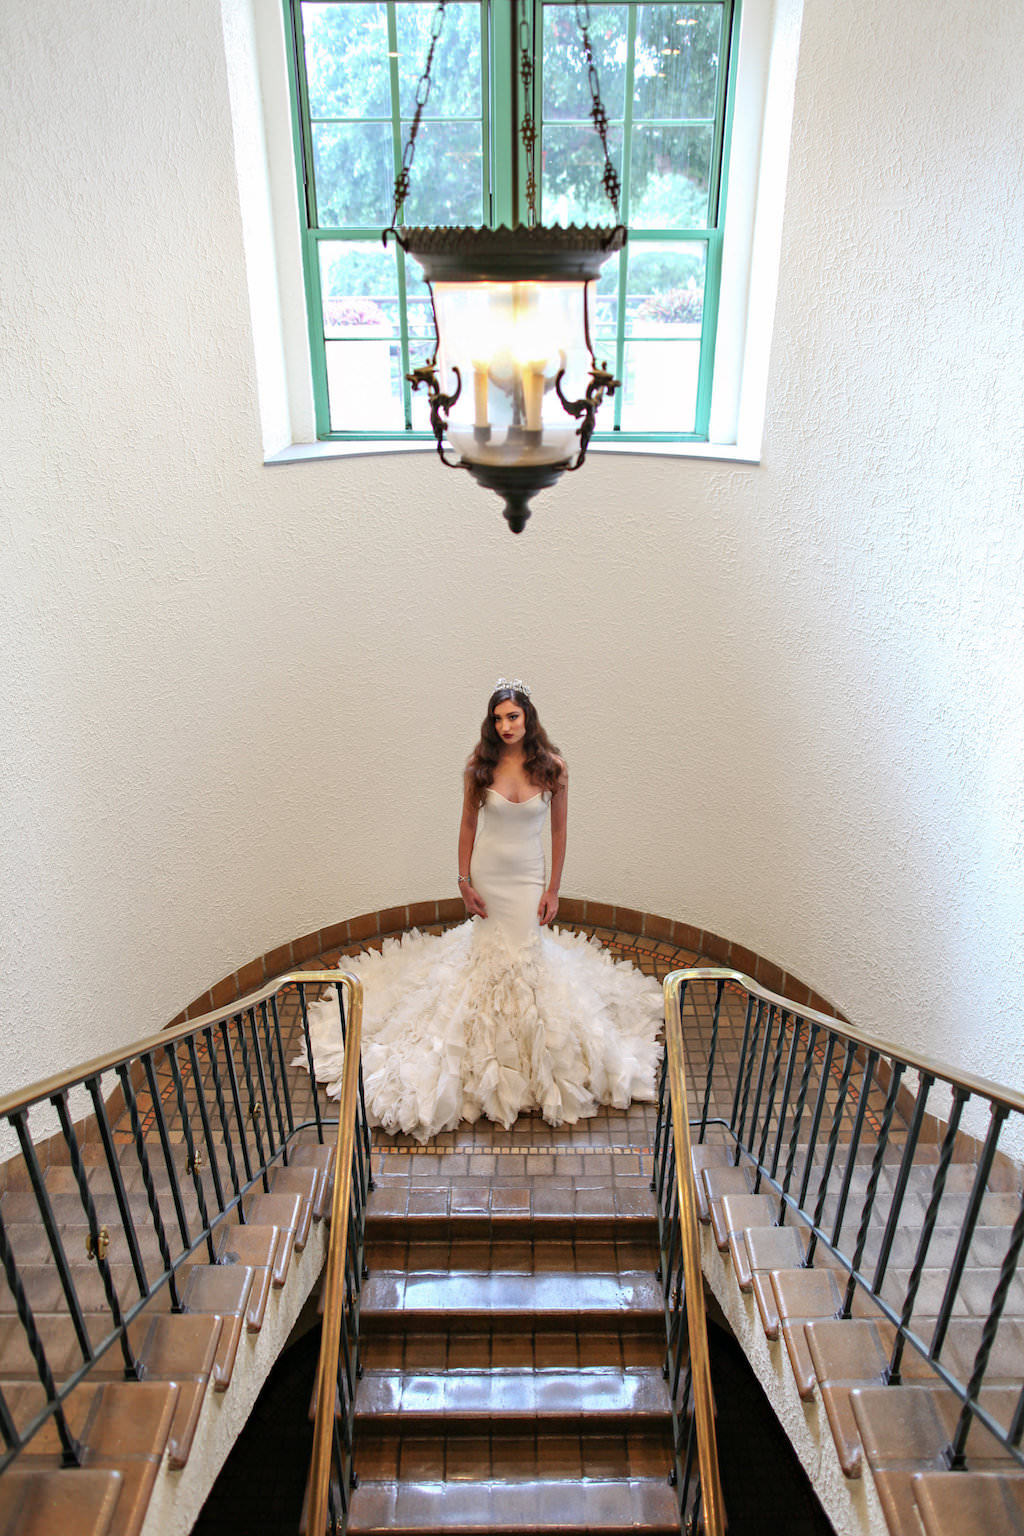 Bridal Indoor Staircase Portrait in Layered Mermaid Ines Di Santo Strapless Wedding Dress   St Petersburg FL Historic Venue Vinoy Renaissance